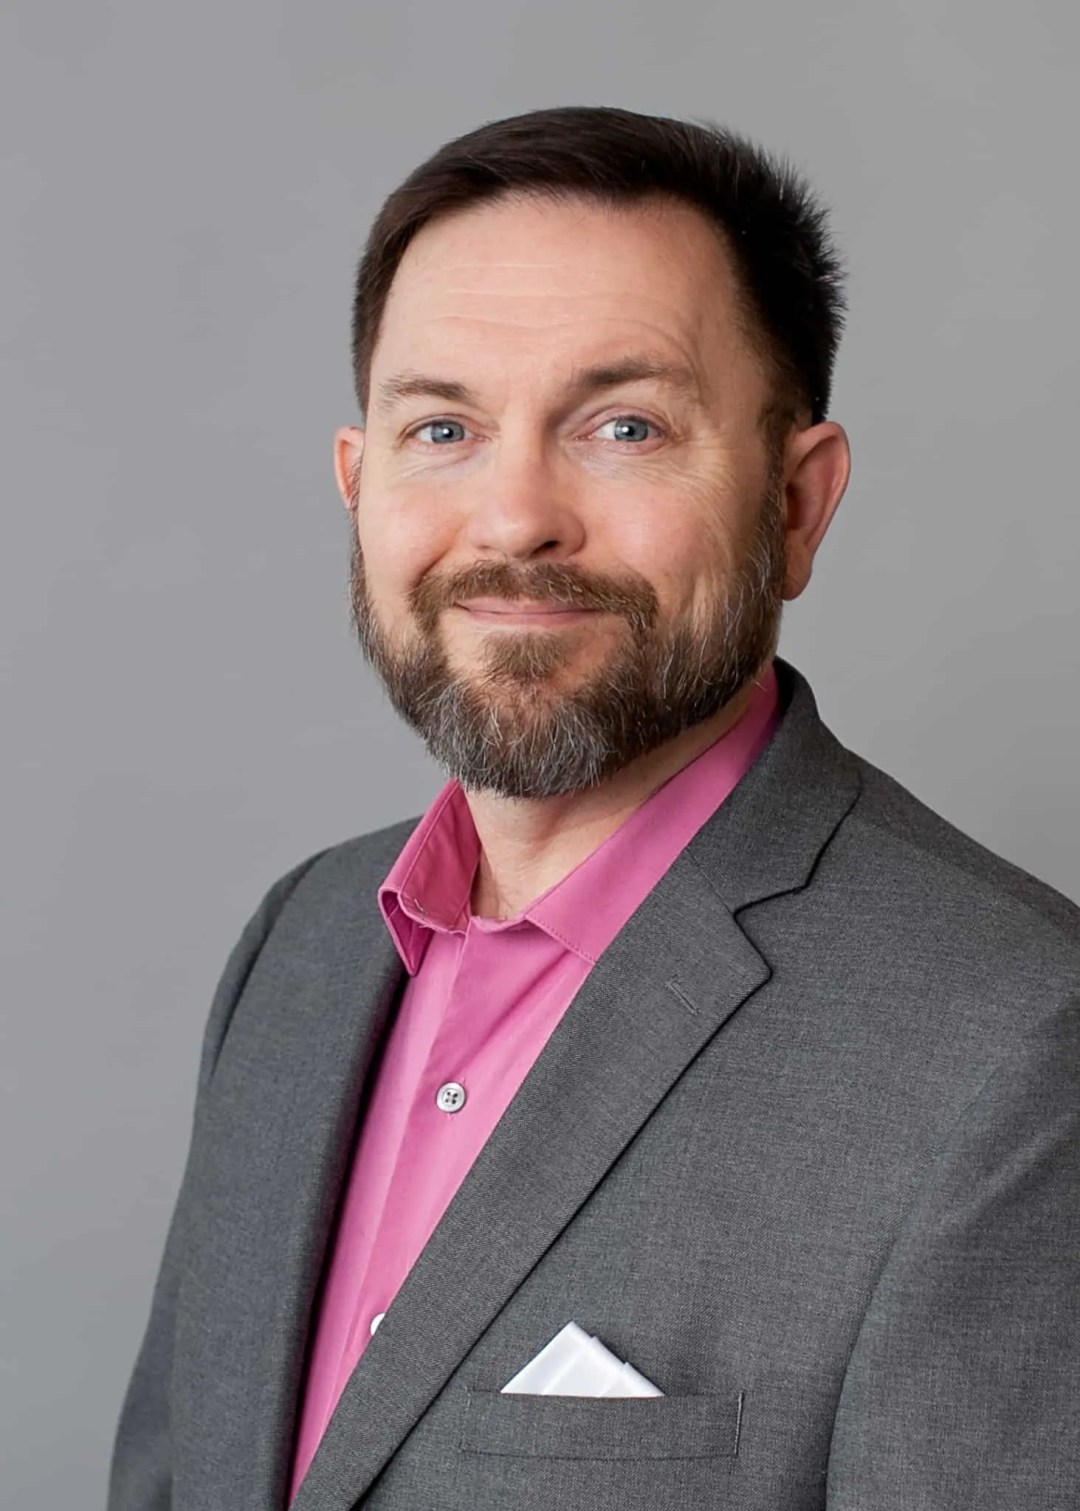 Shawn Soszka, ND, LAc